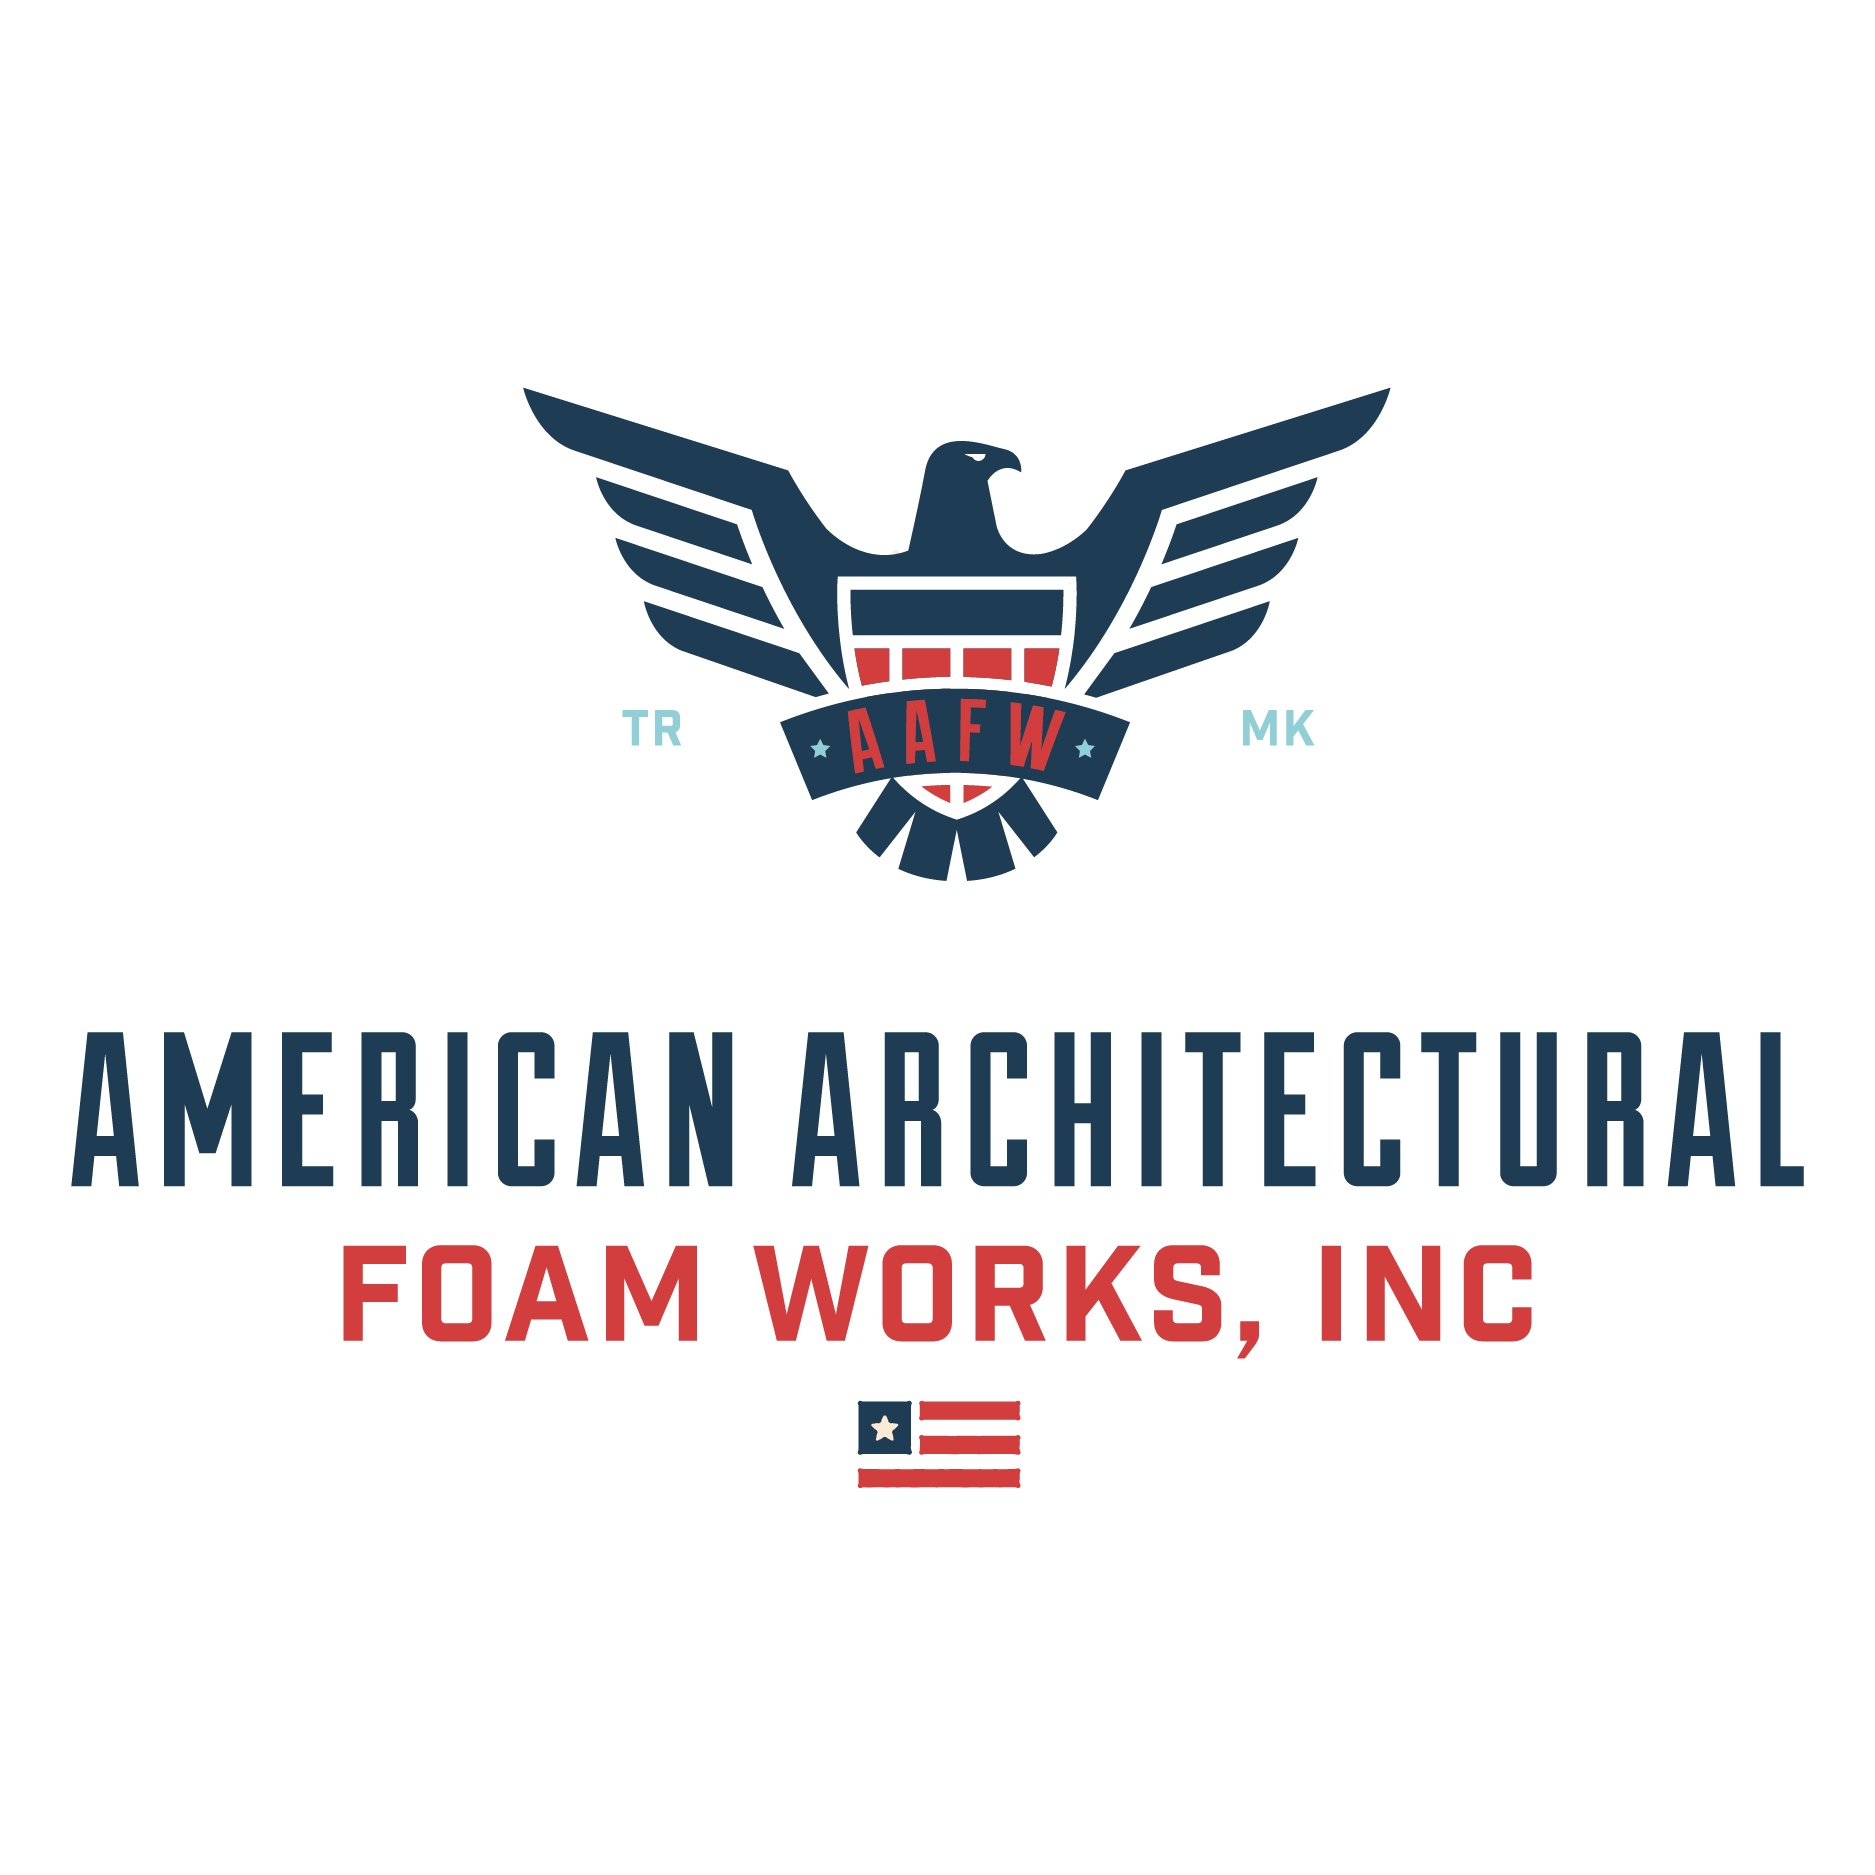 American Architectural Foam Works, Inc.